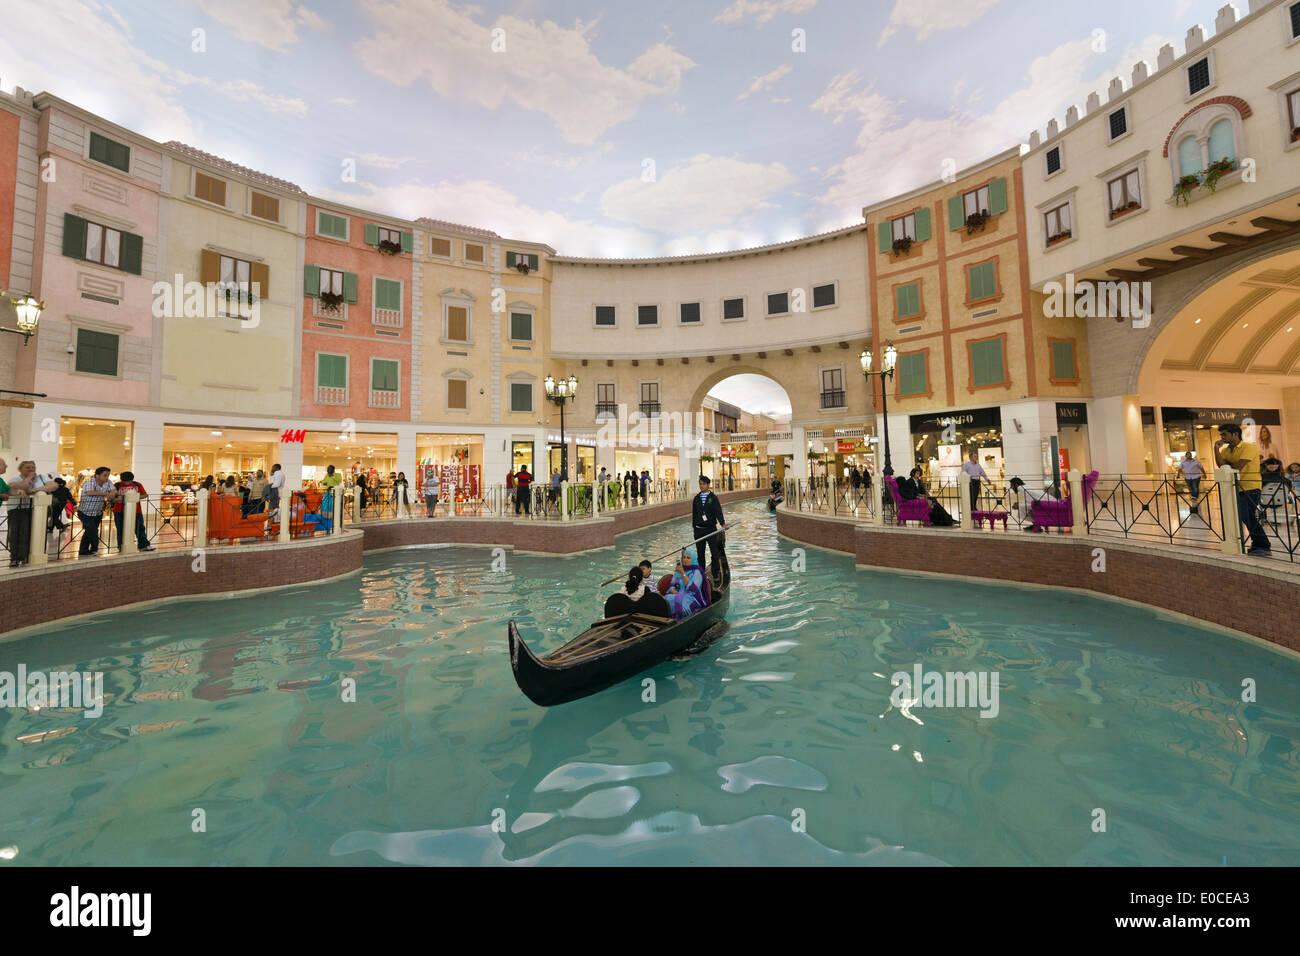 Doha. Le Qatar. Villaggio shopping mall. Photo Stock